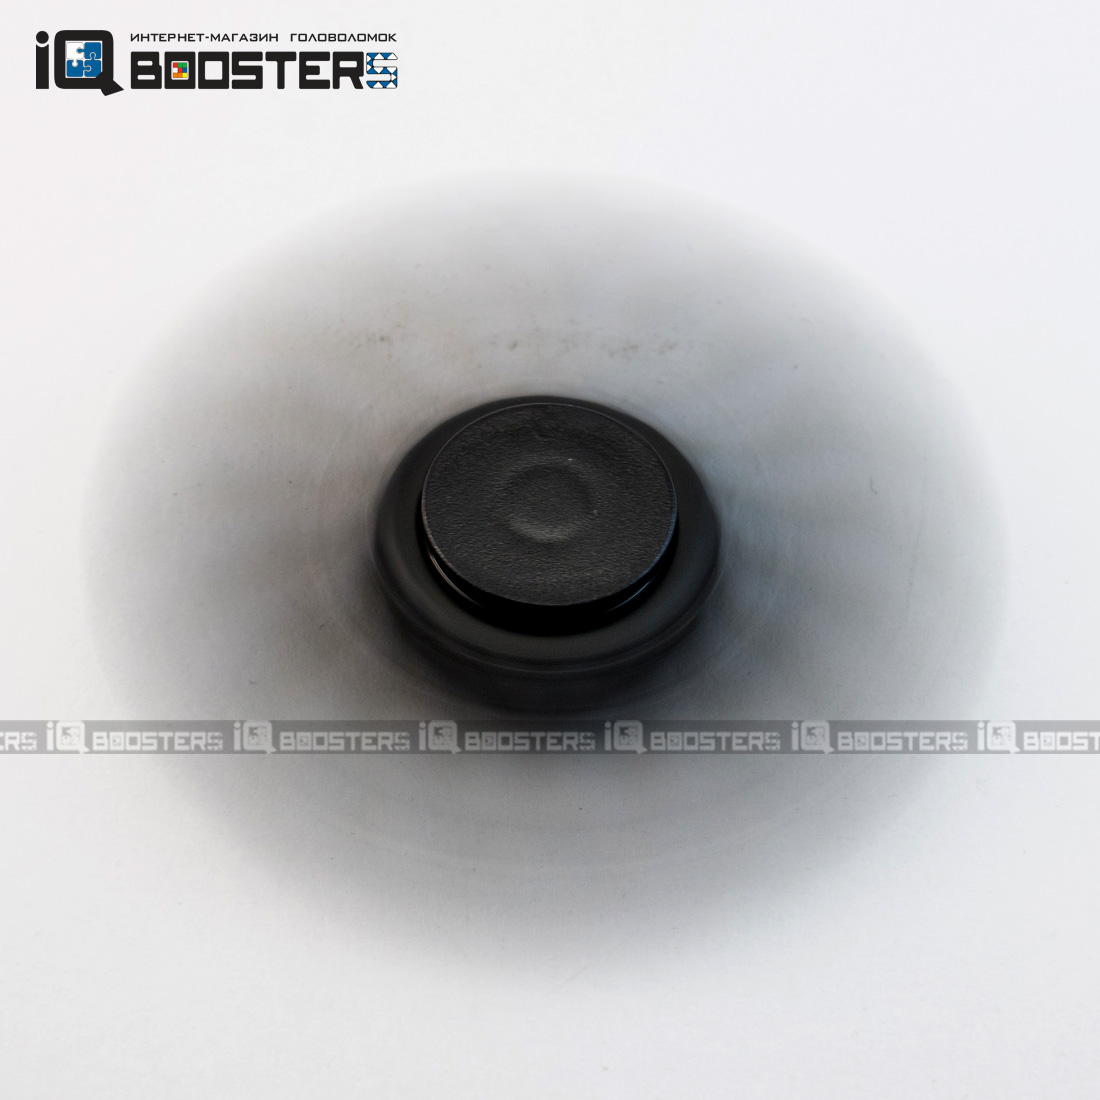 fidget_spinner-1_b2